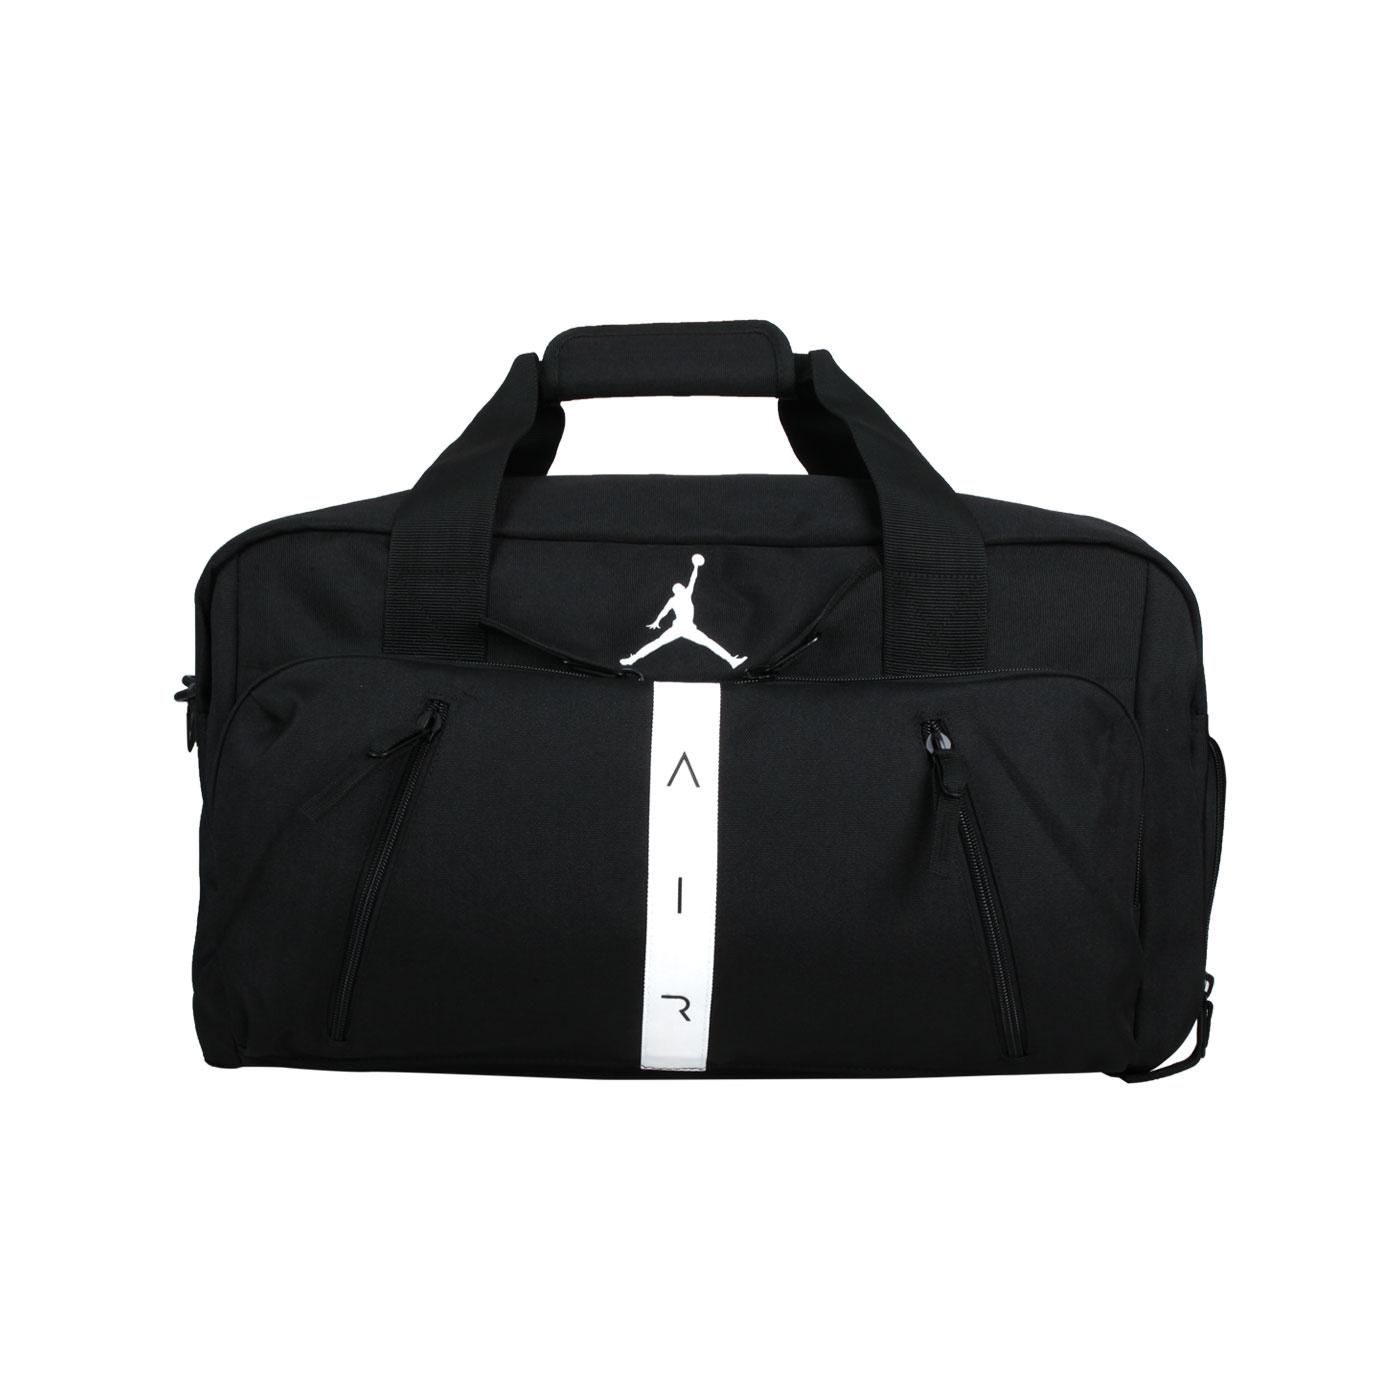 NIKE JORDAN 大型旅行袋 JD2113019AD-001 - 黑白